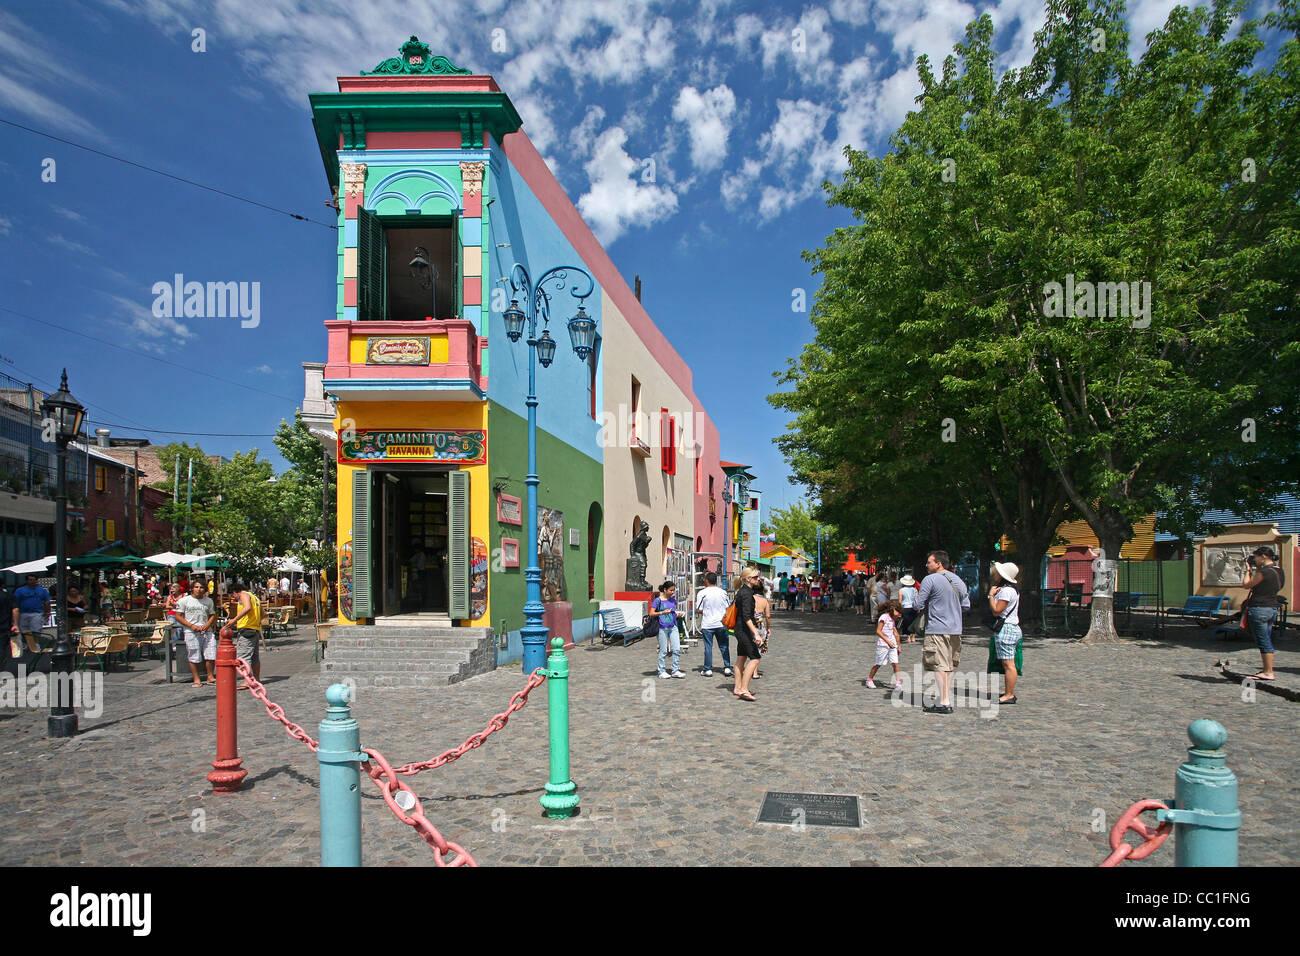 Der Caminito Tango Lore im Barrio La Boca, Buenos Aires, Argentinien Stockbild